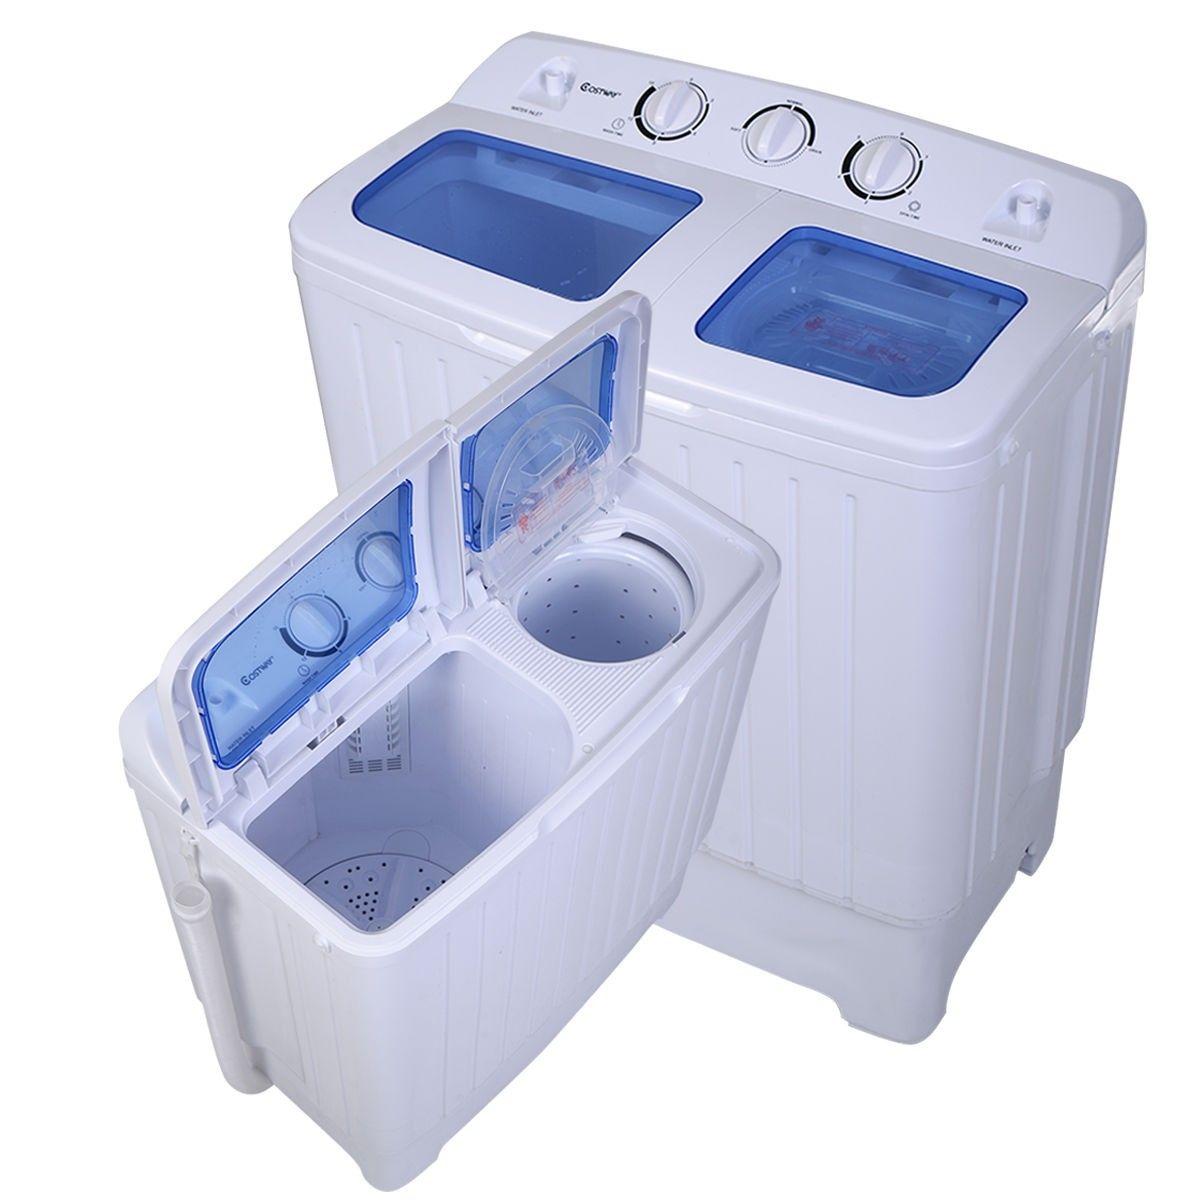 11 Lbs Compact Twin Tub Washing Machine Washer Spinner Mini